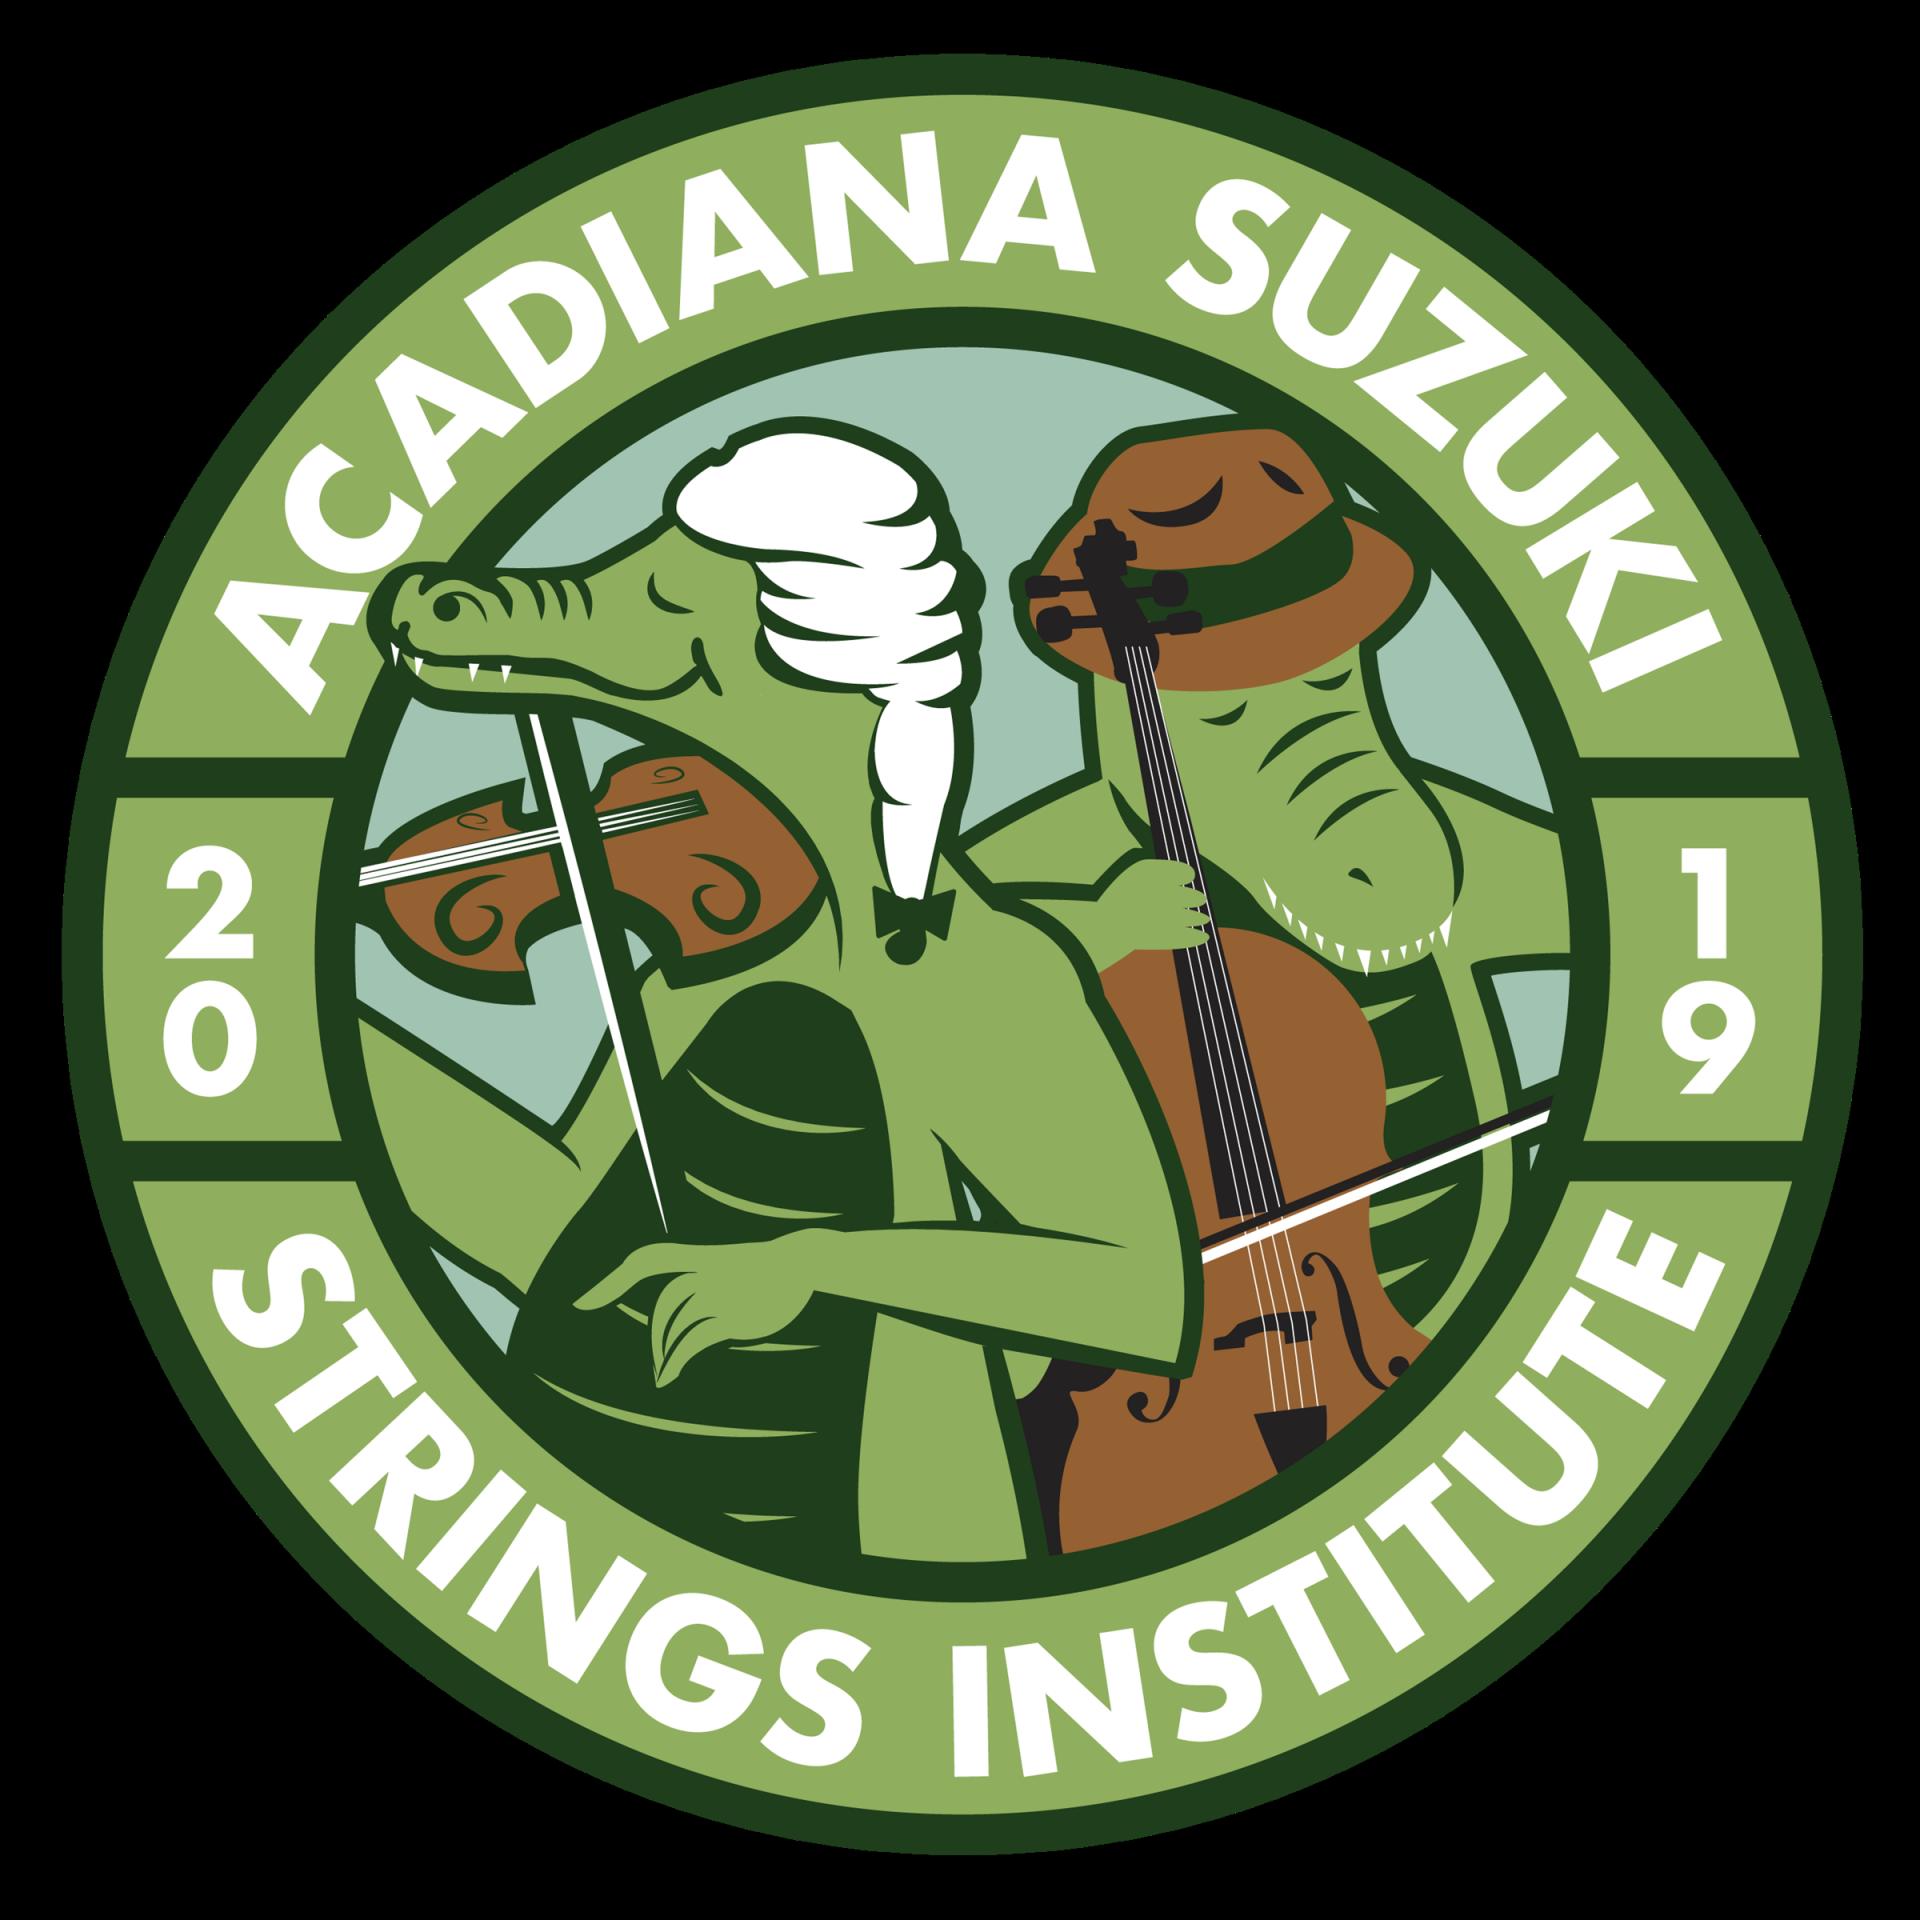 Episcopal School of Acadiana | Acadiana Suzuki Strings Institute